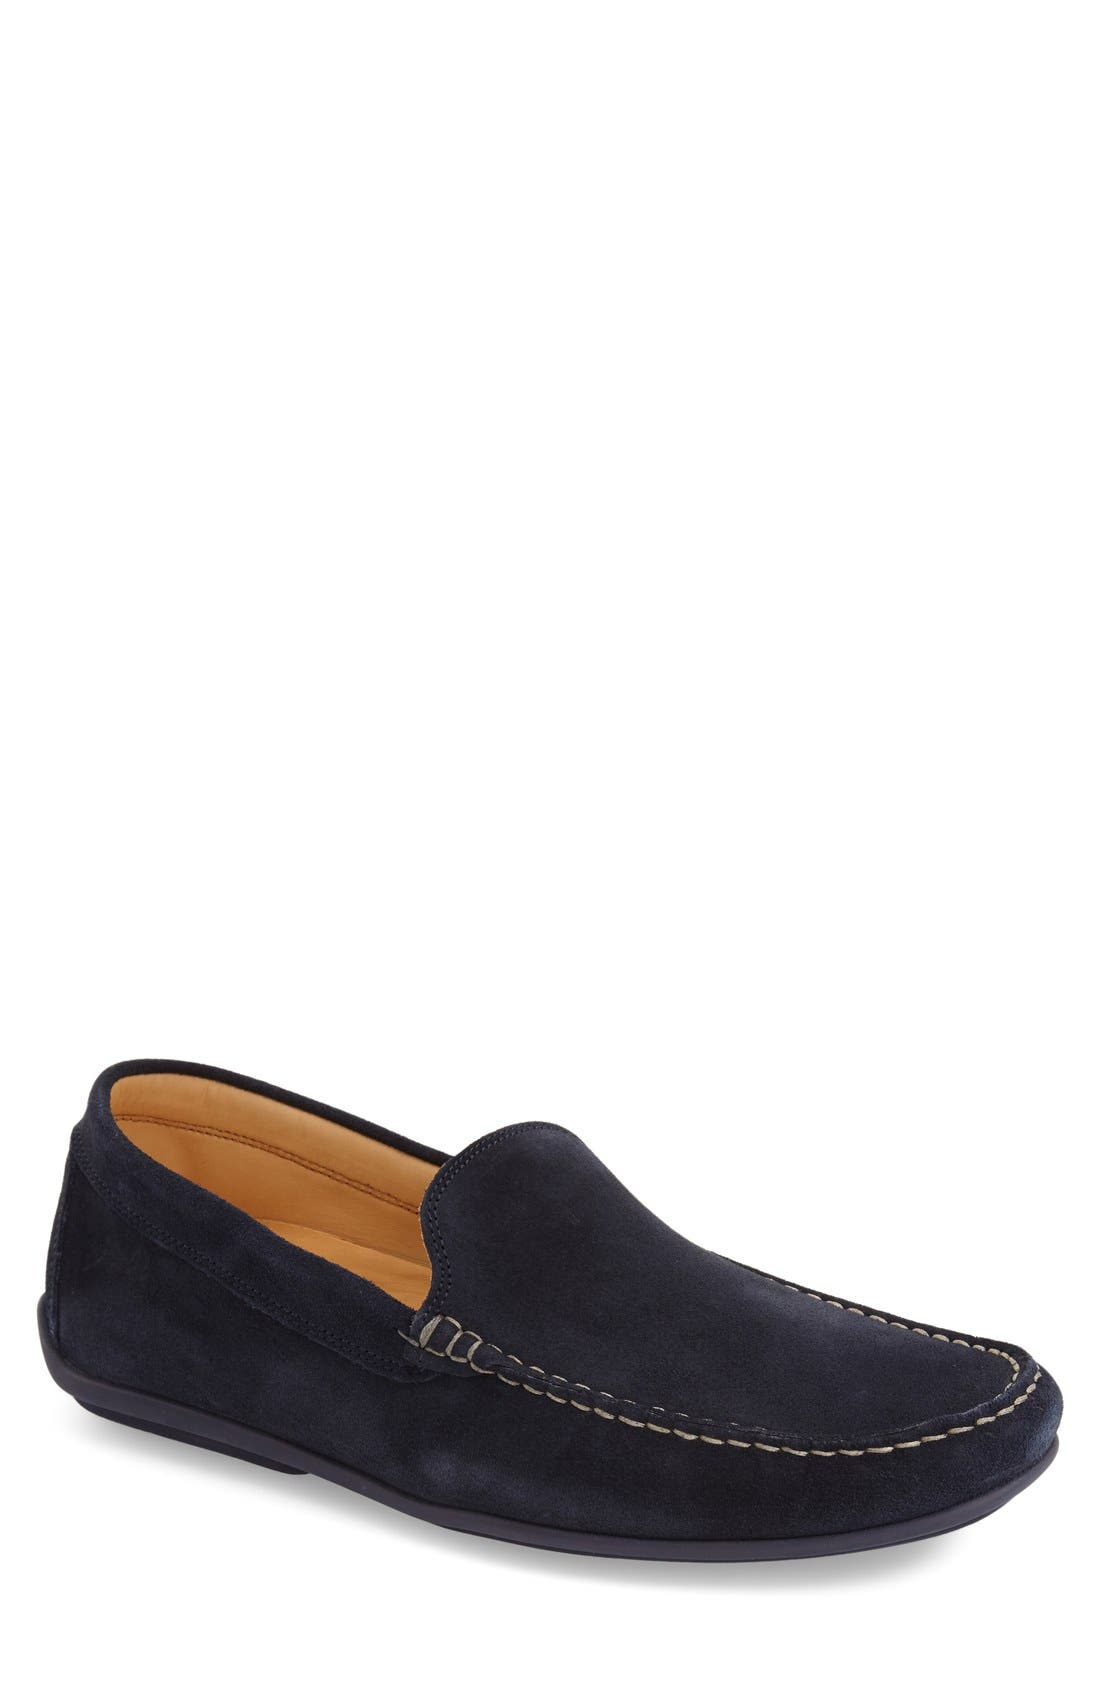 'Meridians' Loafer,                         Main,                         color, Navy Suede